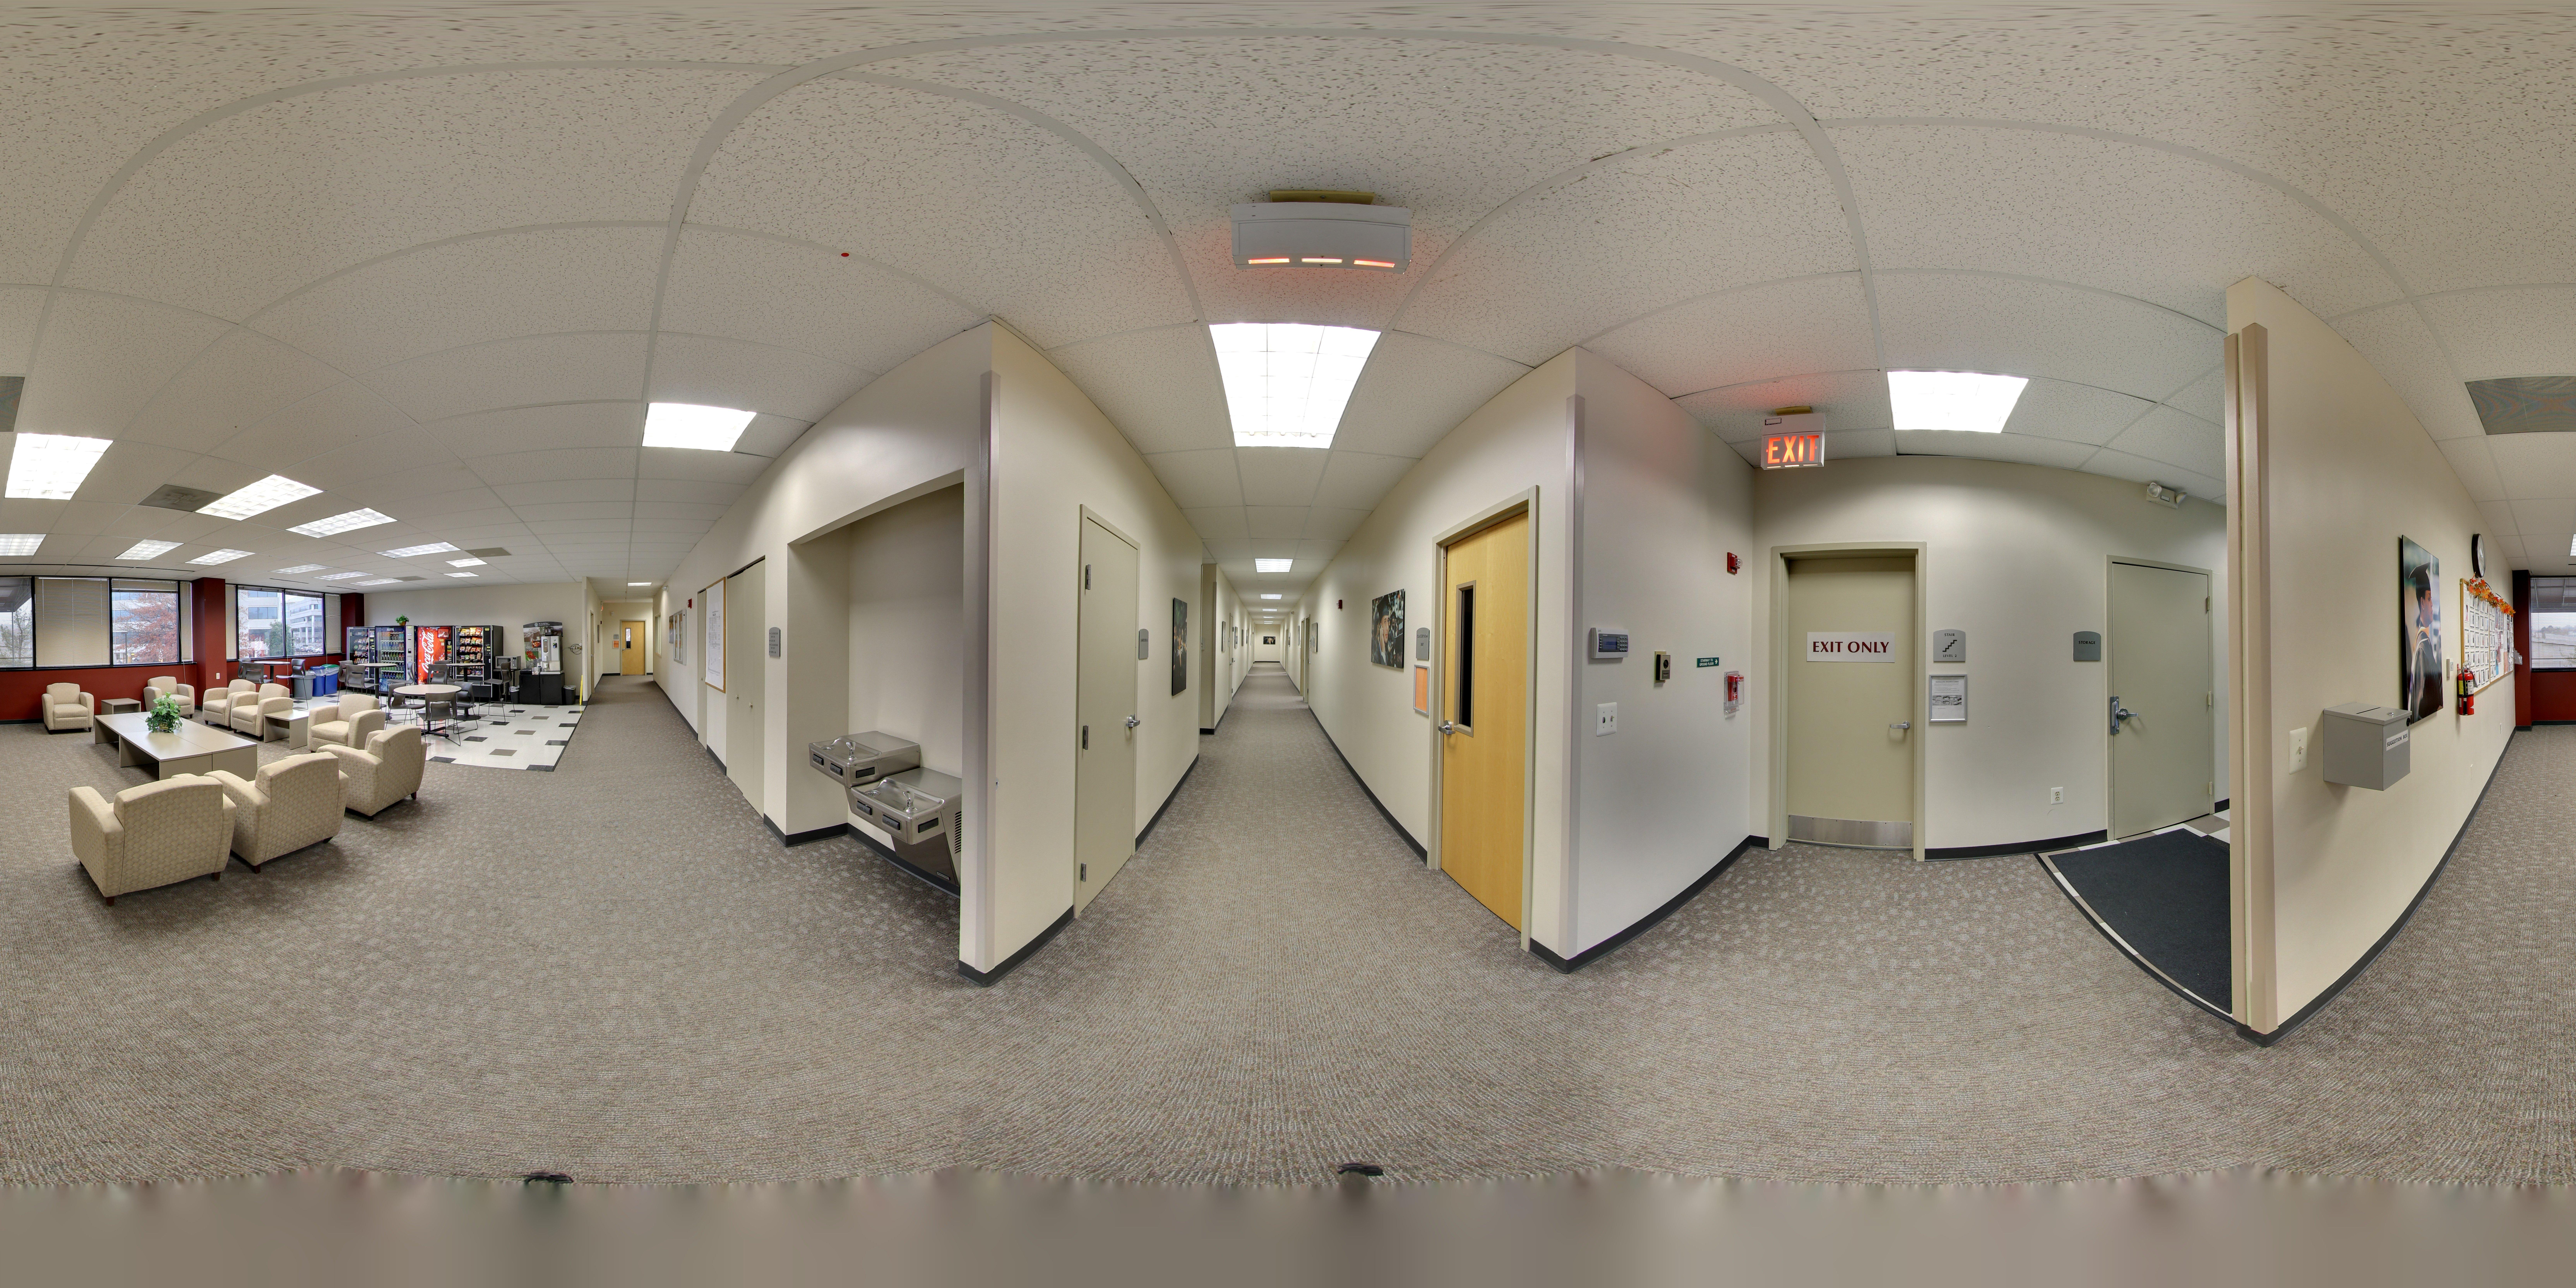 Strayer University image 41